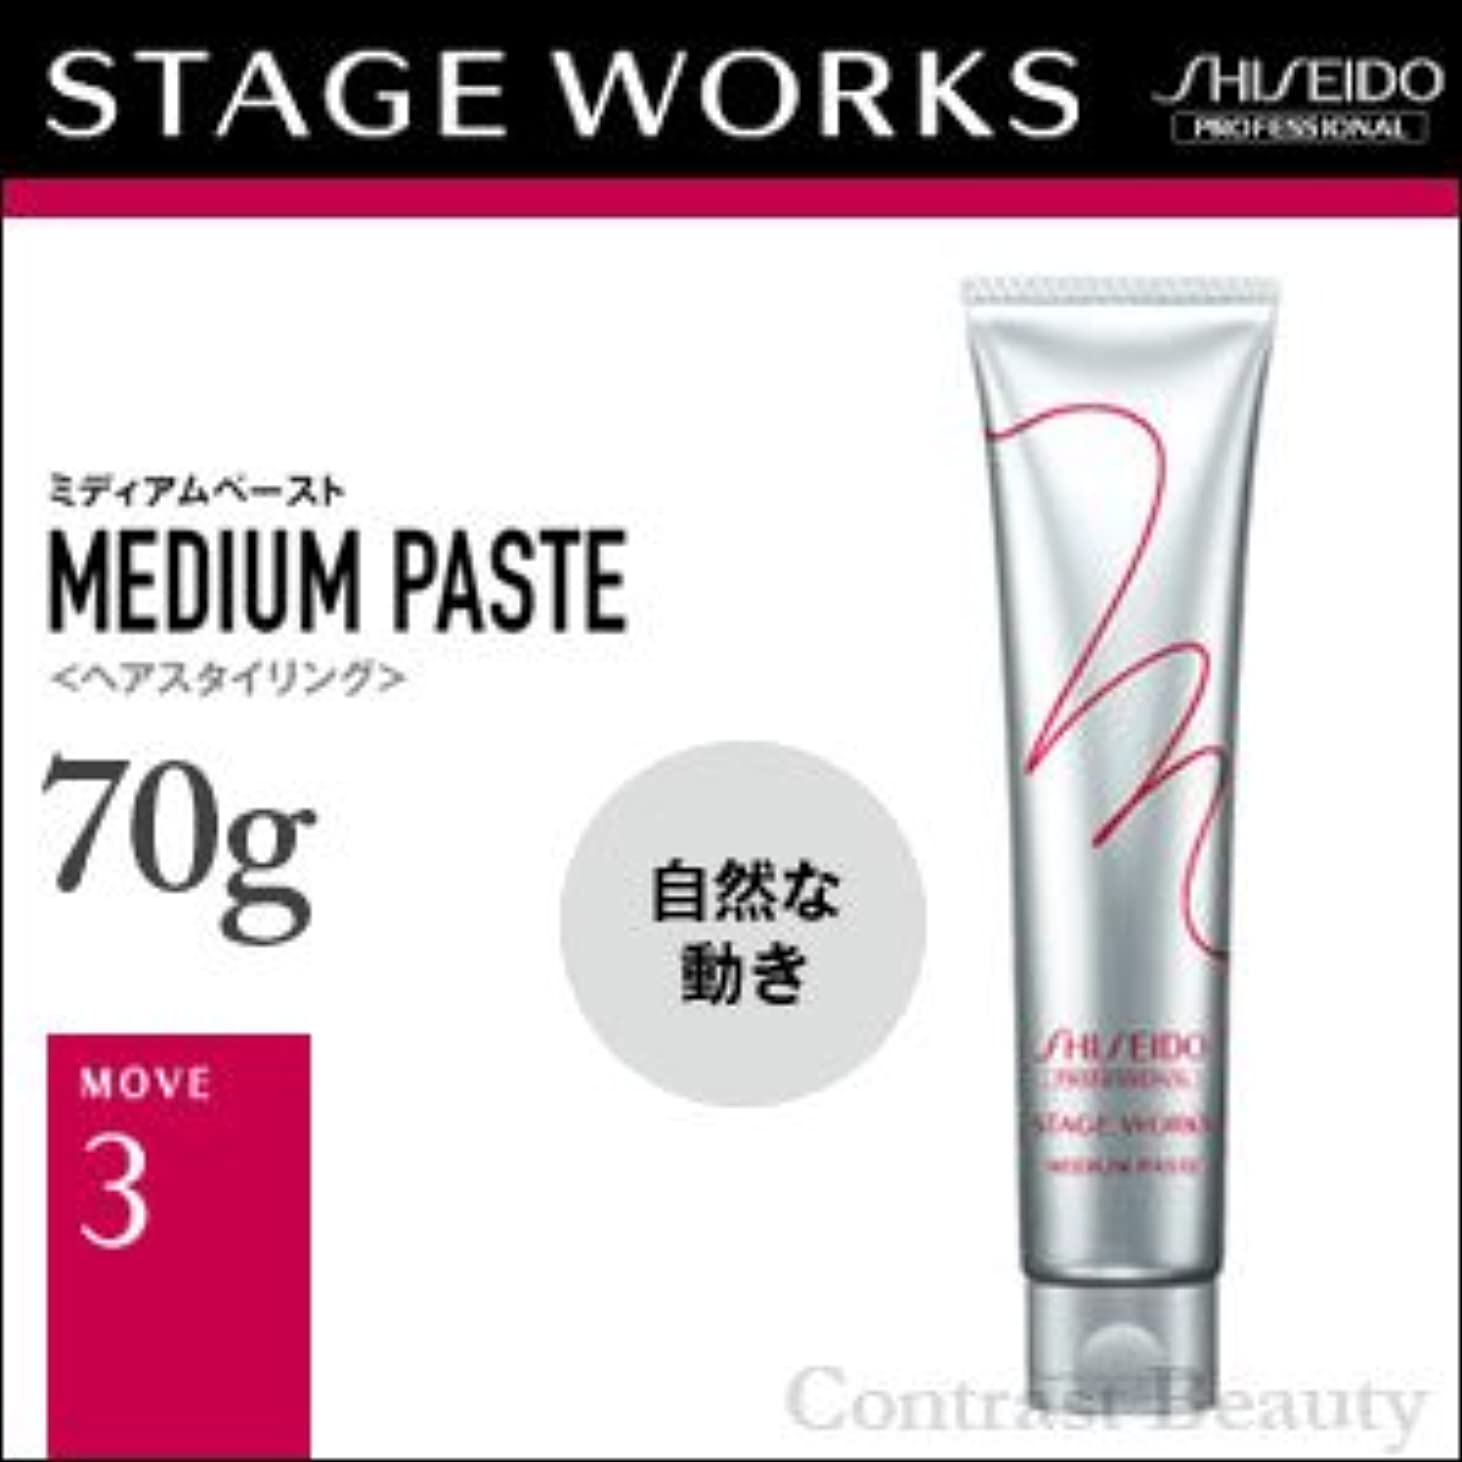 【x5個セット】 資生堂 ステージワークス ムーブ3 ミディアムペースト 70g